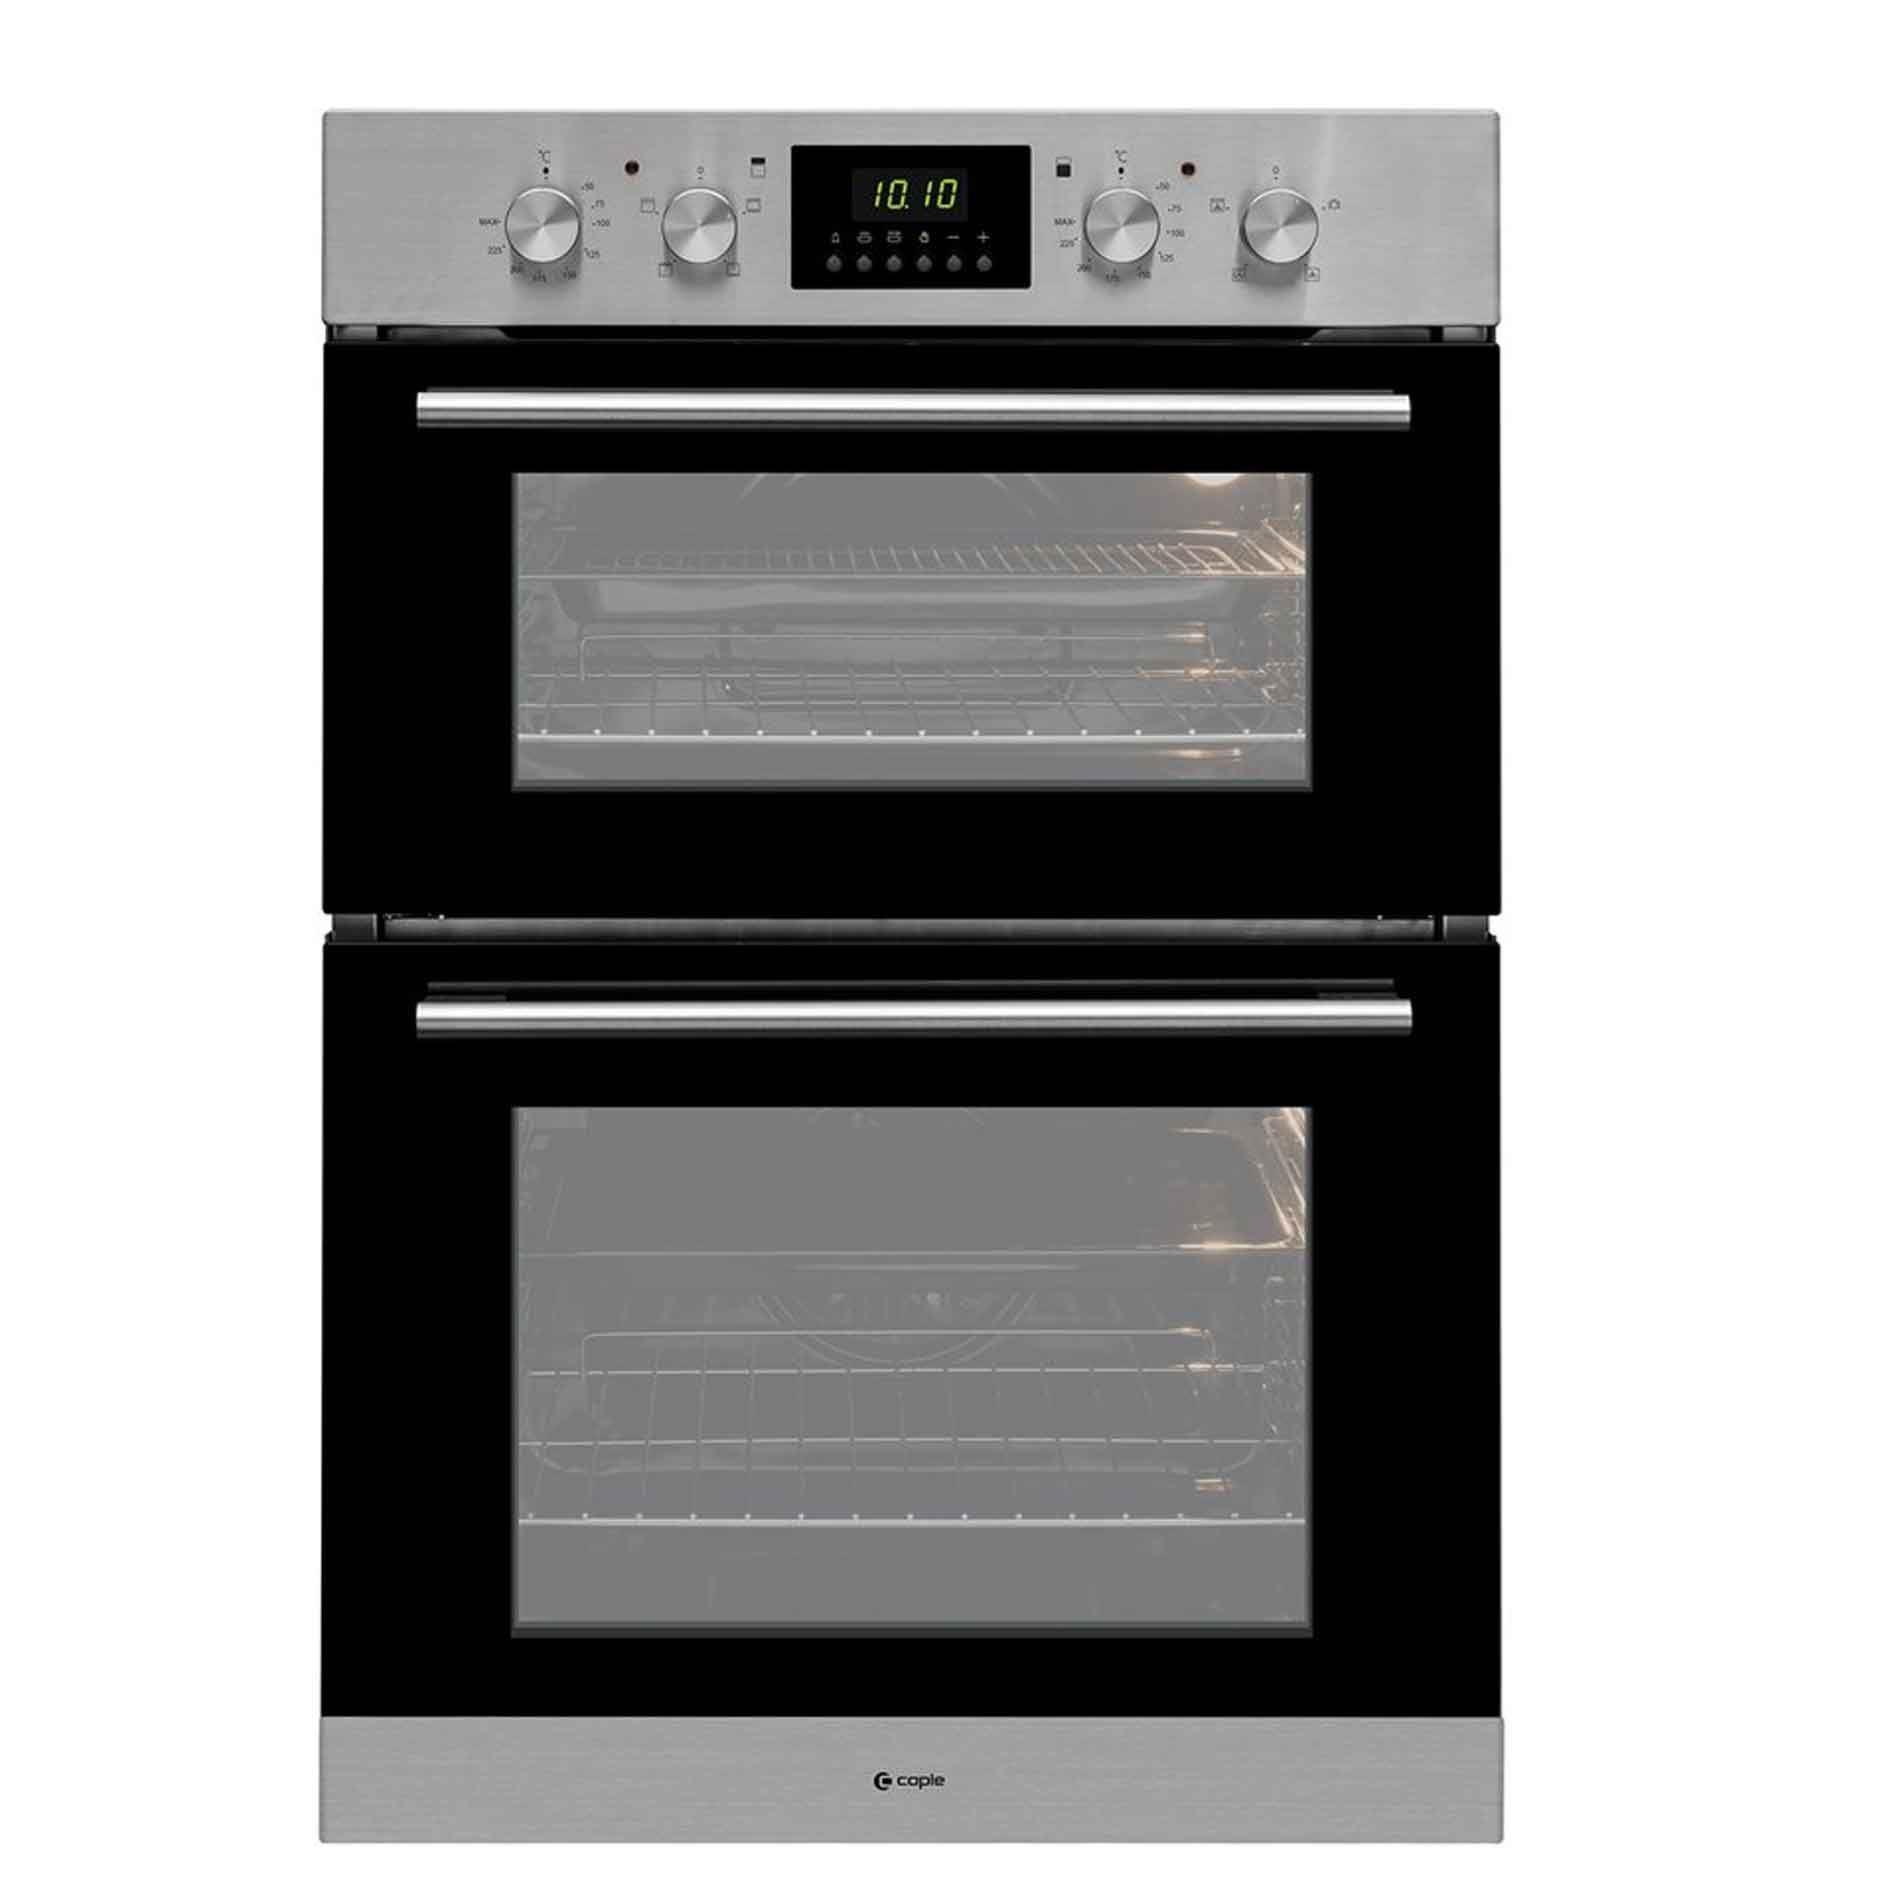 caple c3248 built in double oven appliance source. Black Bedroom Furniture Sets. Home Design Ideas